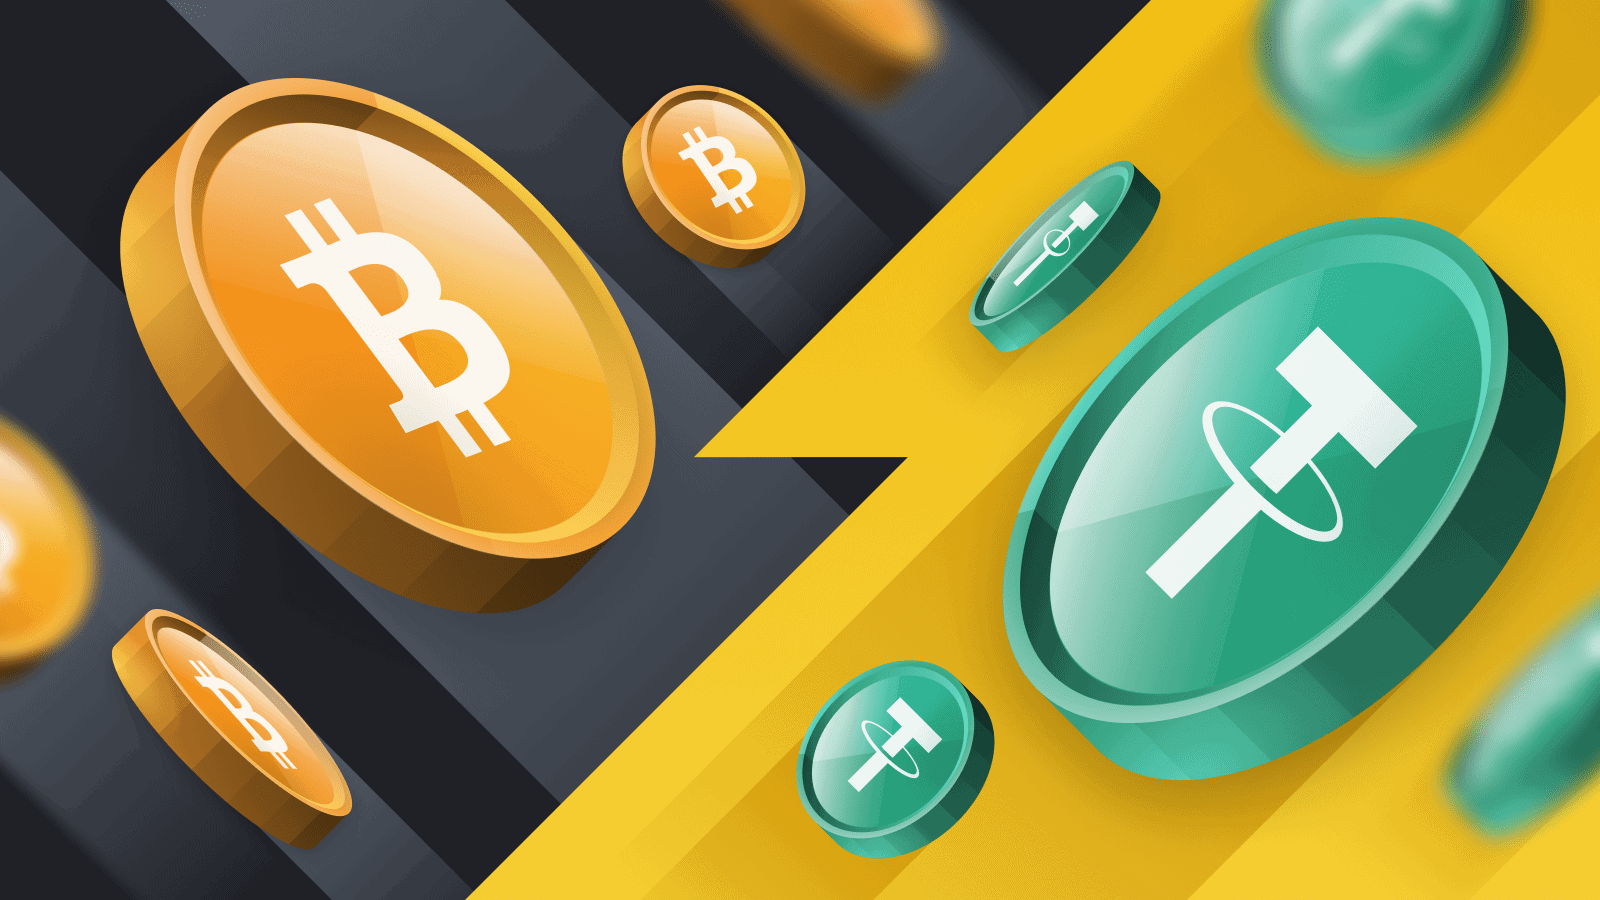 How to convert bitcoin to USDT on Kraken?